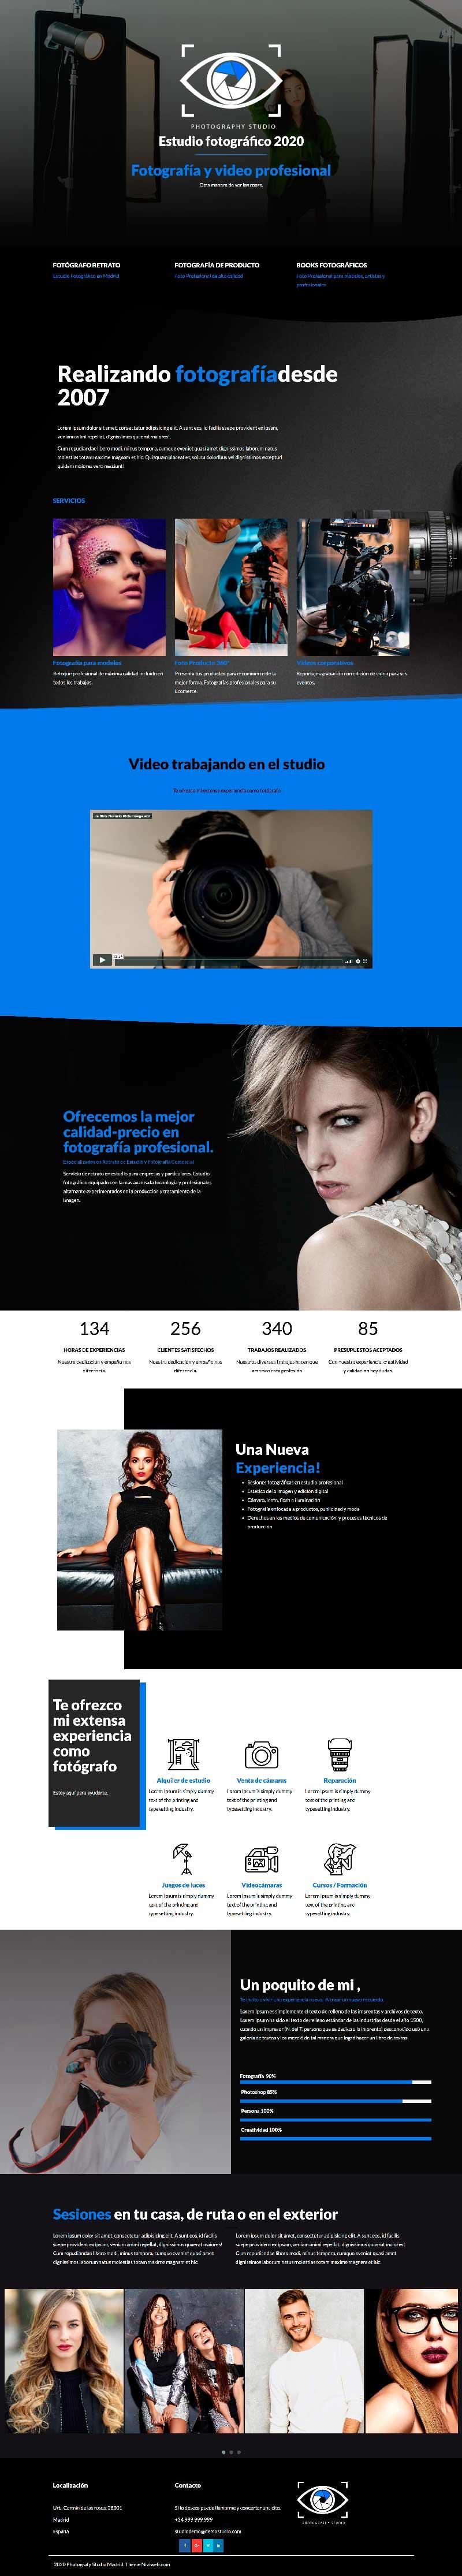 Plantilla web para fotógrafo Wordpress